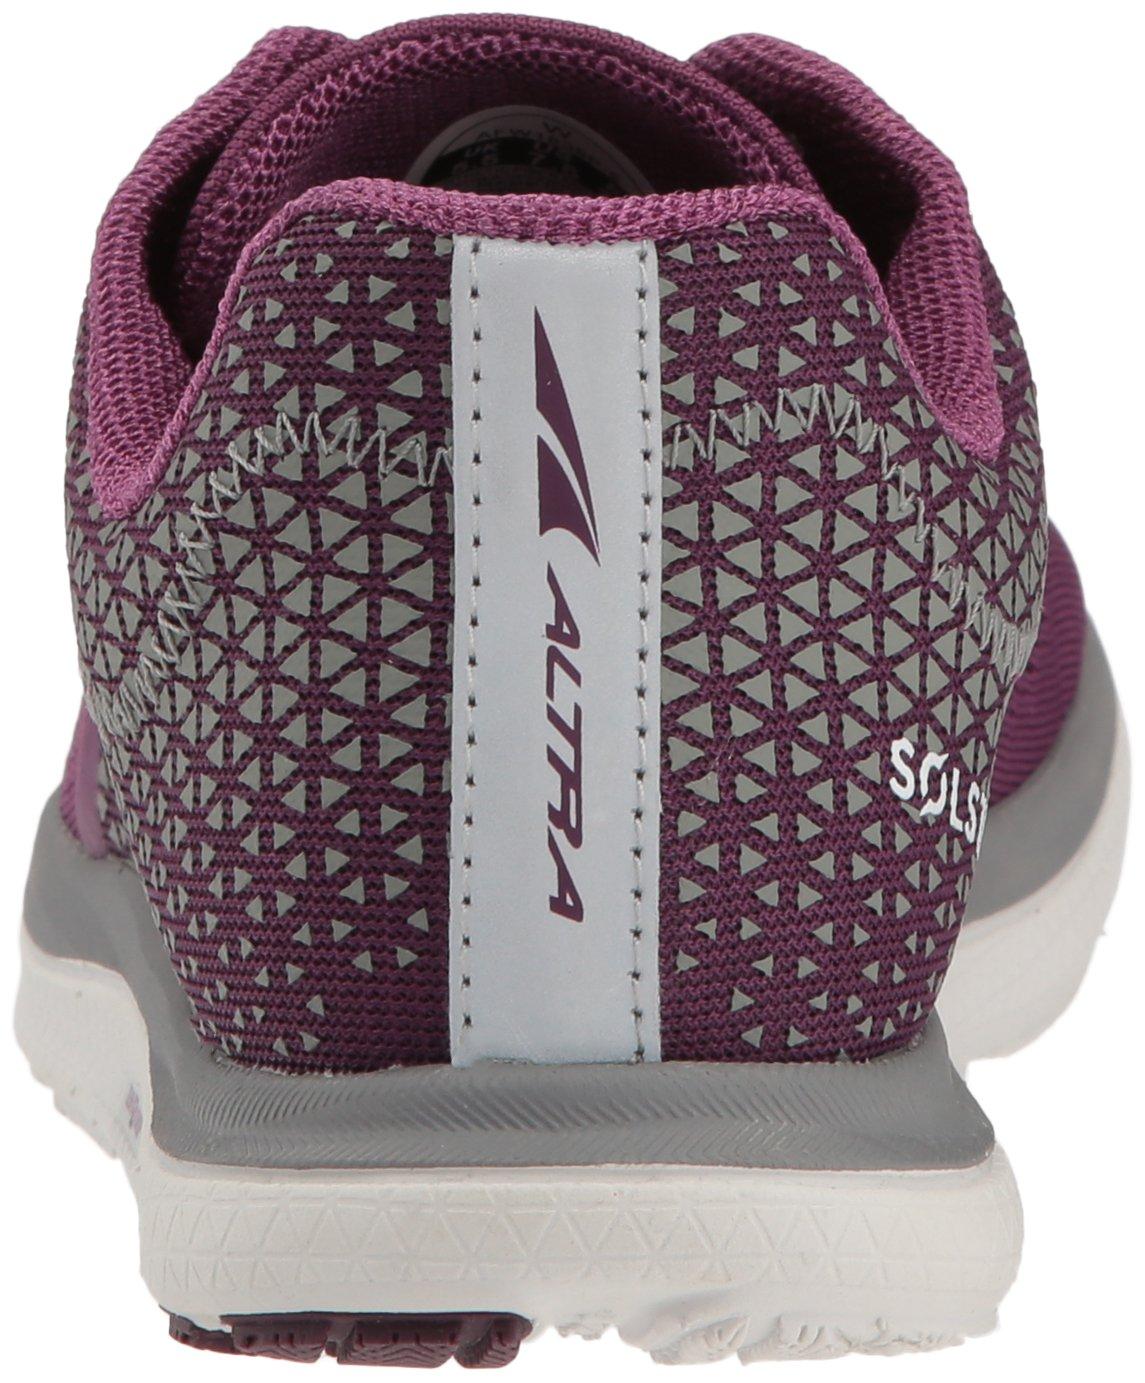 Altra Women's Solstice Sneaker, Purple, 5.5 Regular US by Altra (Image #2)